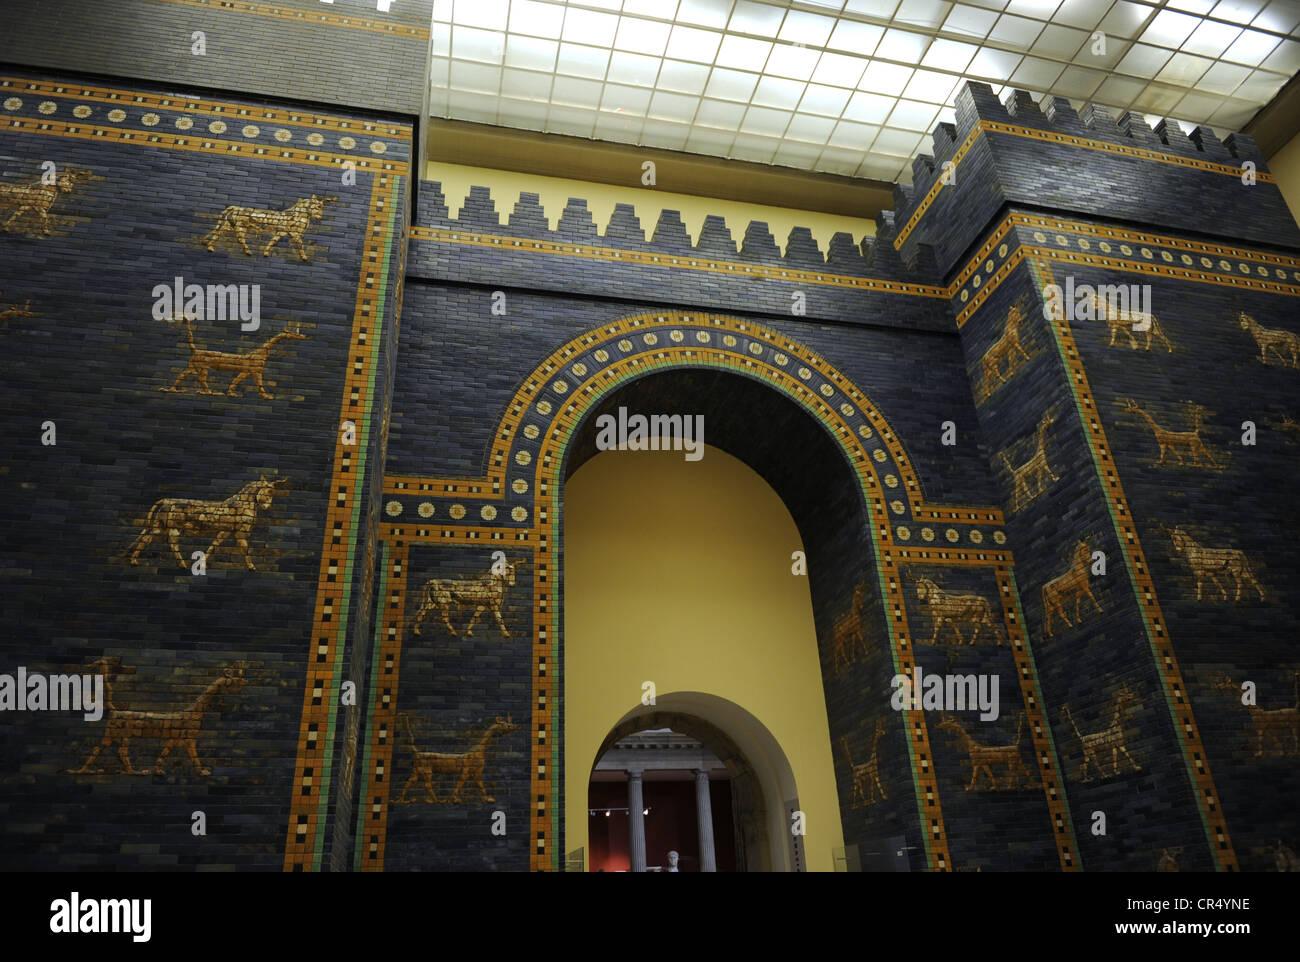 mesopotamian art neo babylonian ishtar gate pergamon museum stock